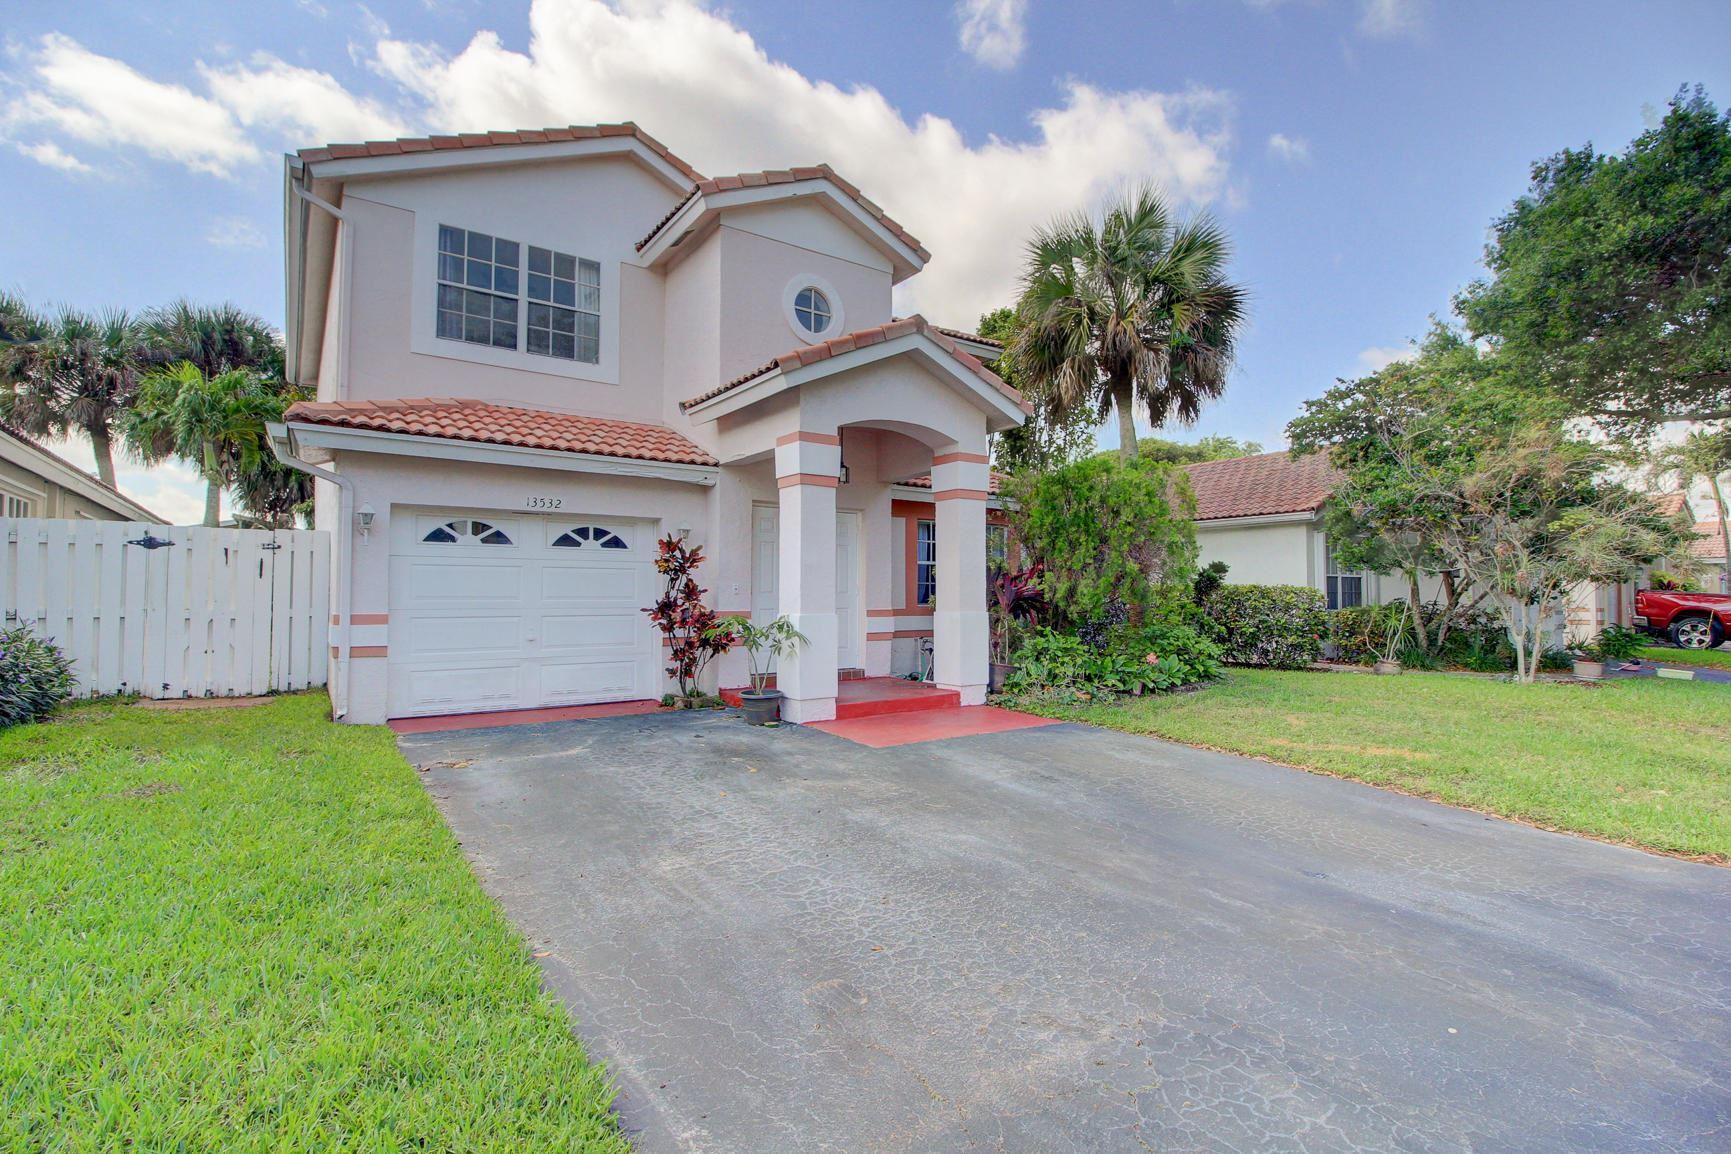 Photo of 13532 NW 5th Court, Plantation, FL 33325 (MLS # RX-10697220)